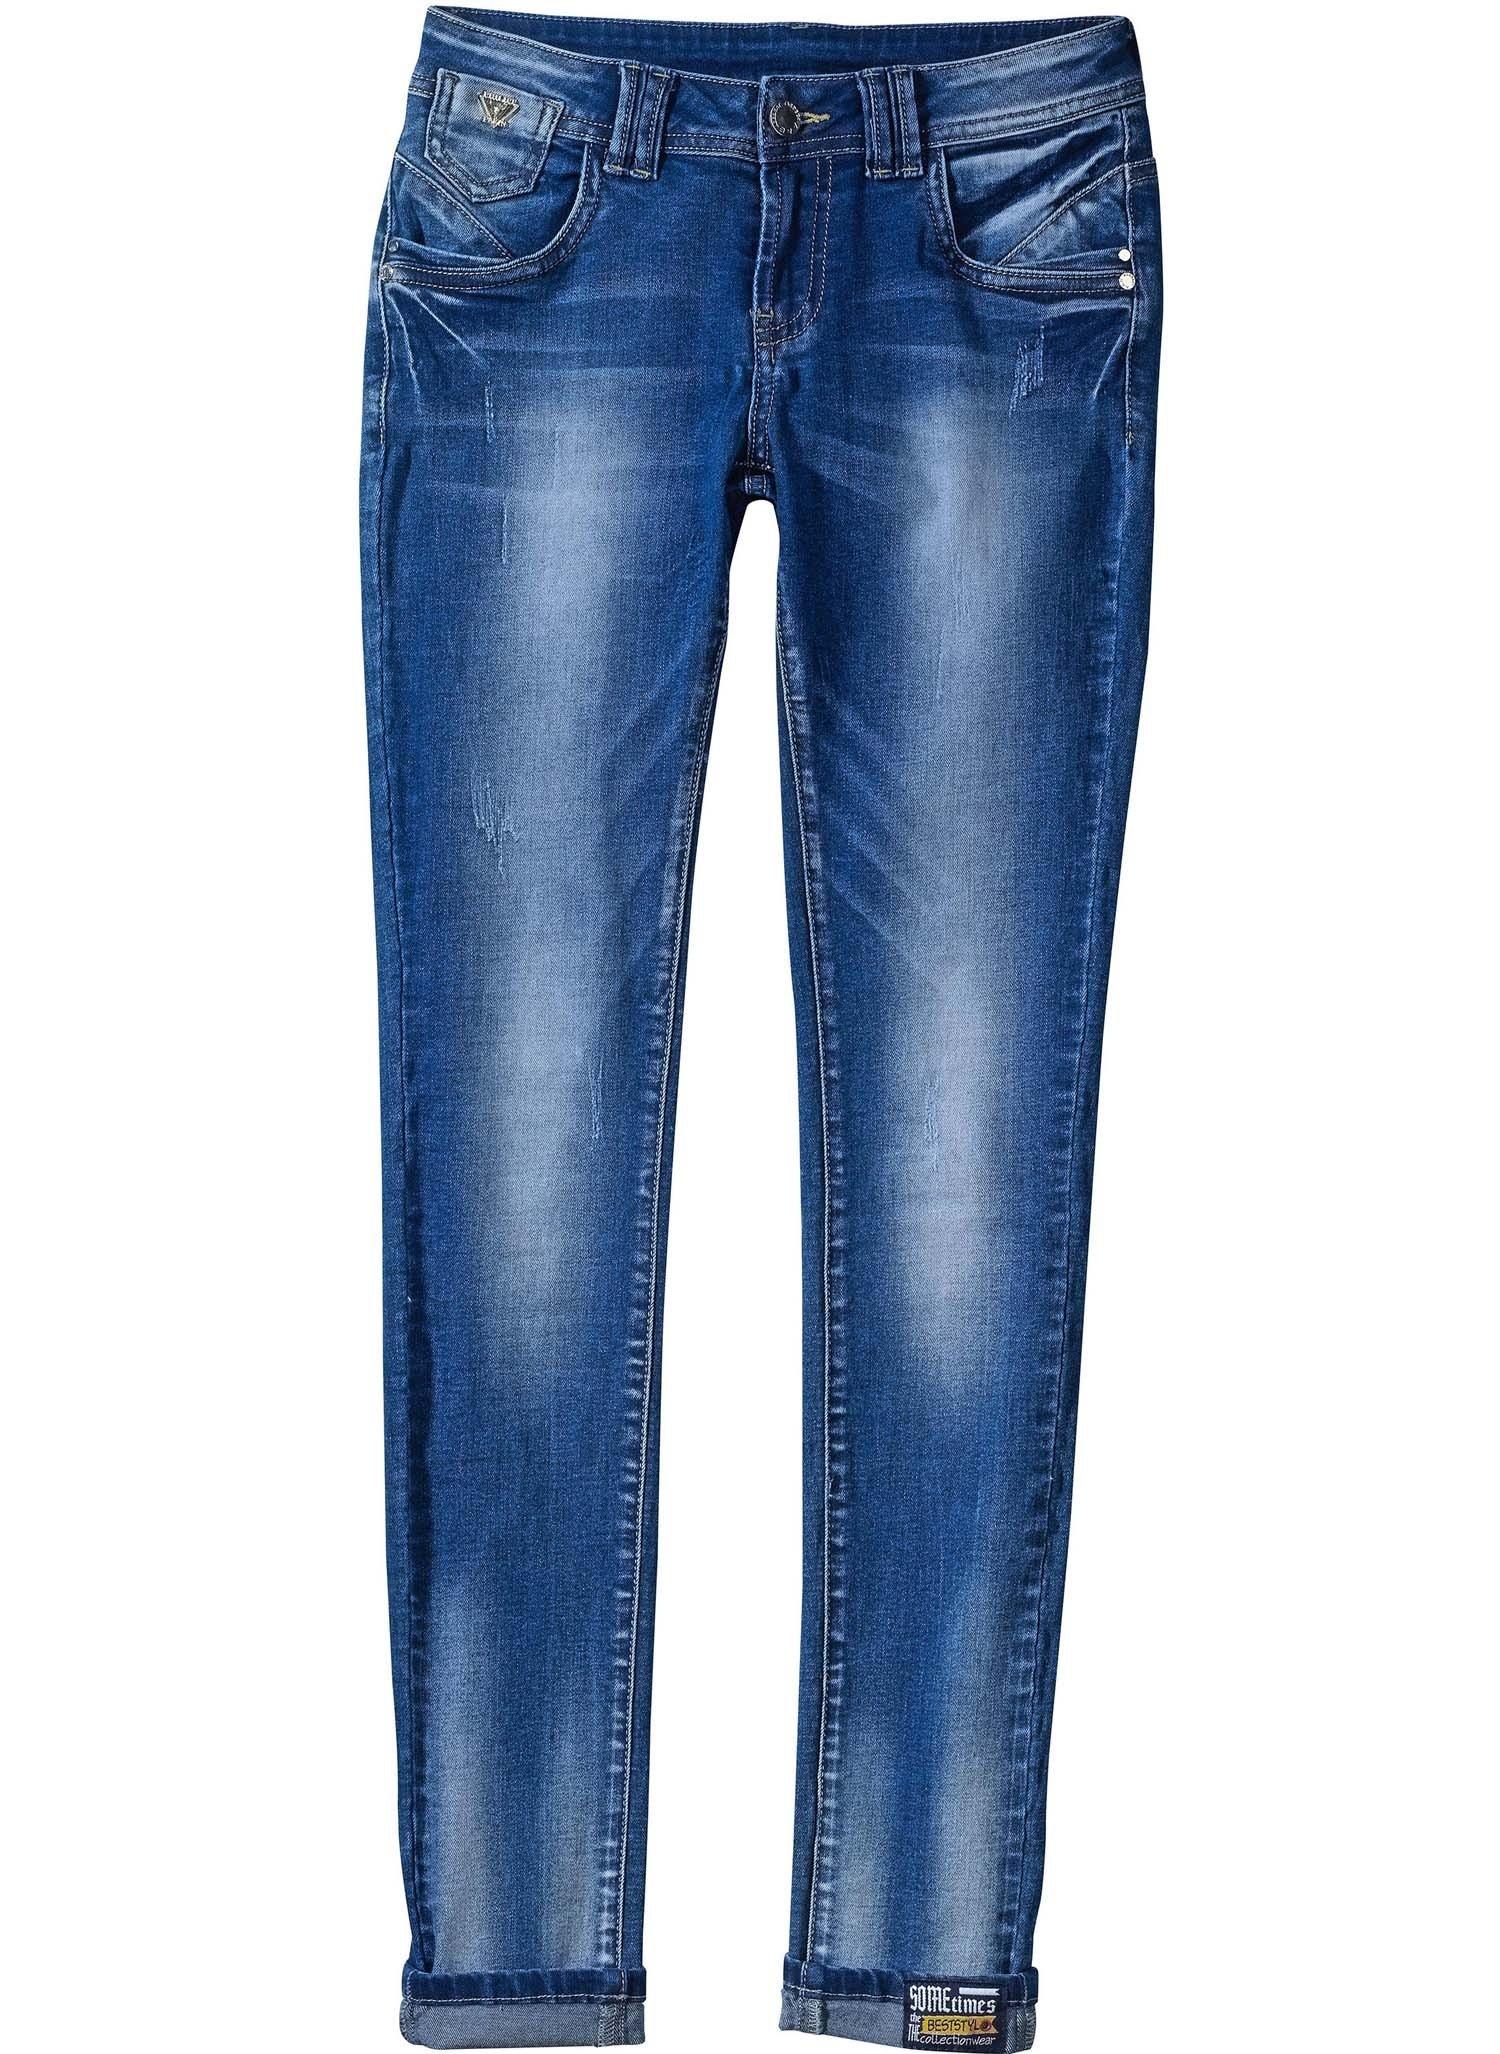 "D-5P.Jeans""SOME-TIME""Blue-Dem. 34 050 - 2 - Ronja.ch"